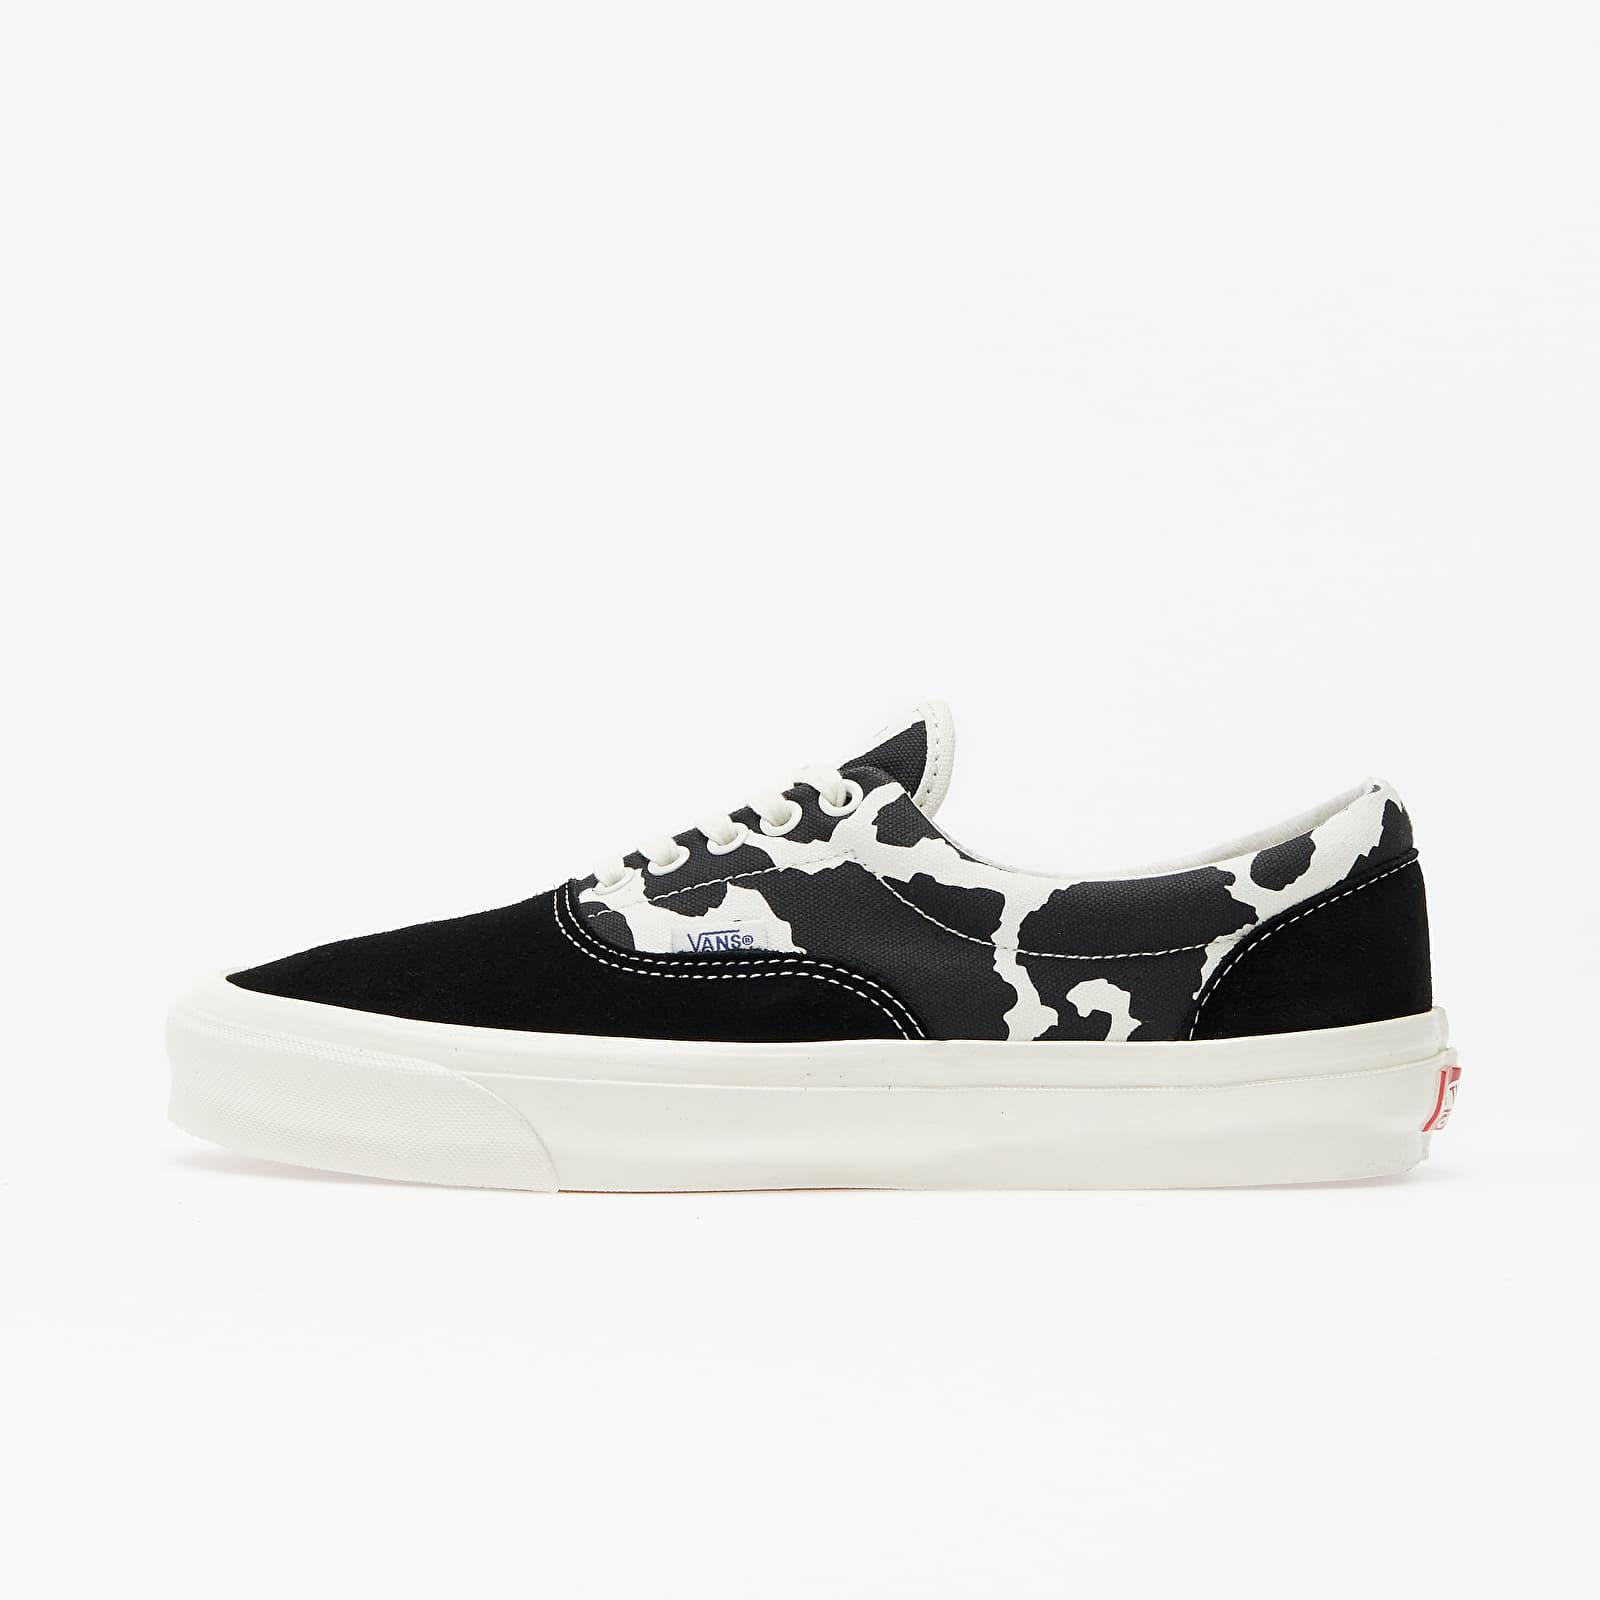 Chaussures et baskets homme Vans OG Era LX (Suede/ Canvas) Classic White/ Black/ Marshmallow